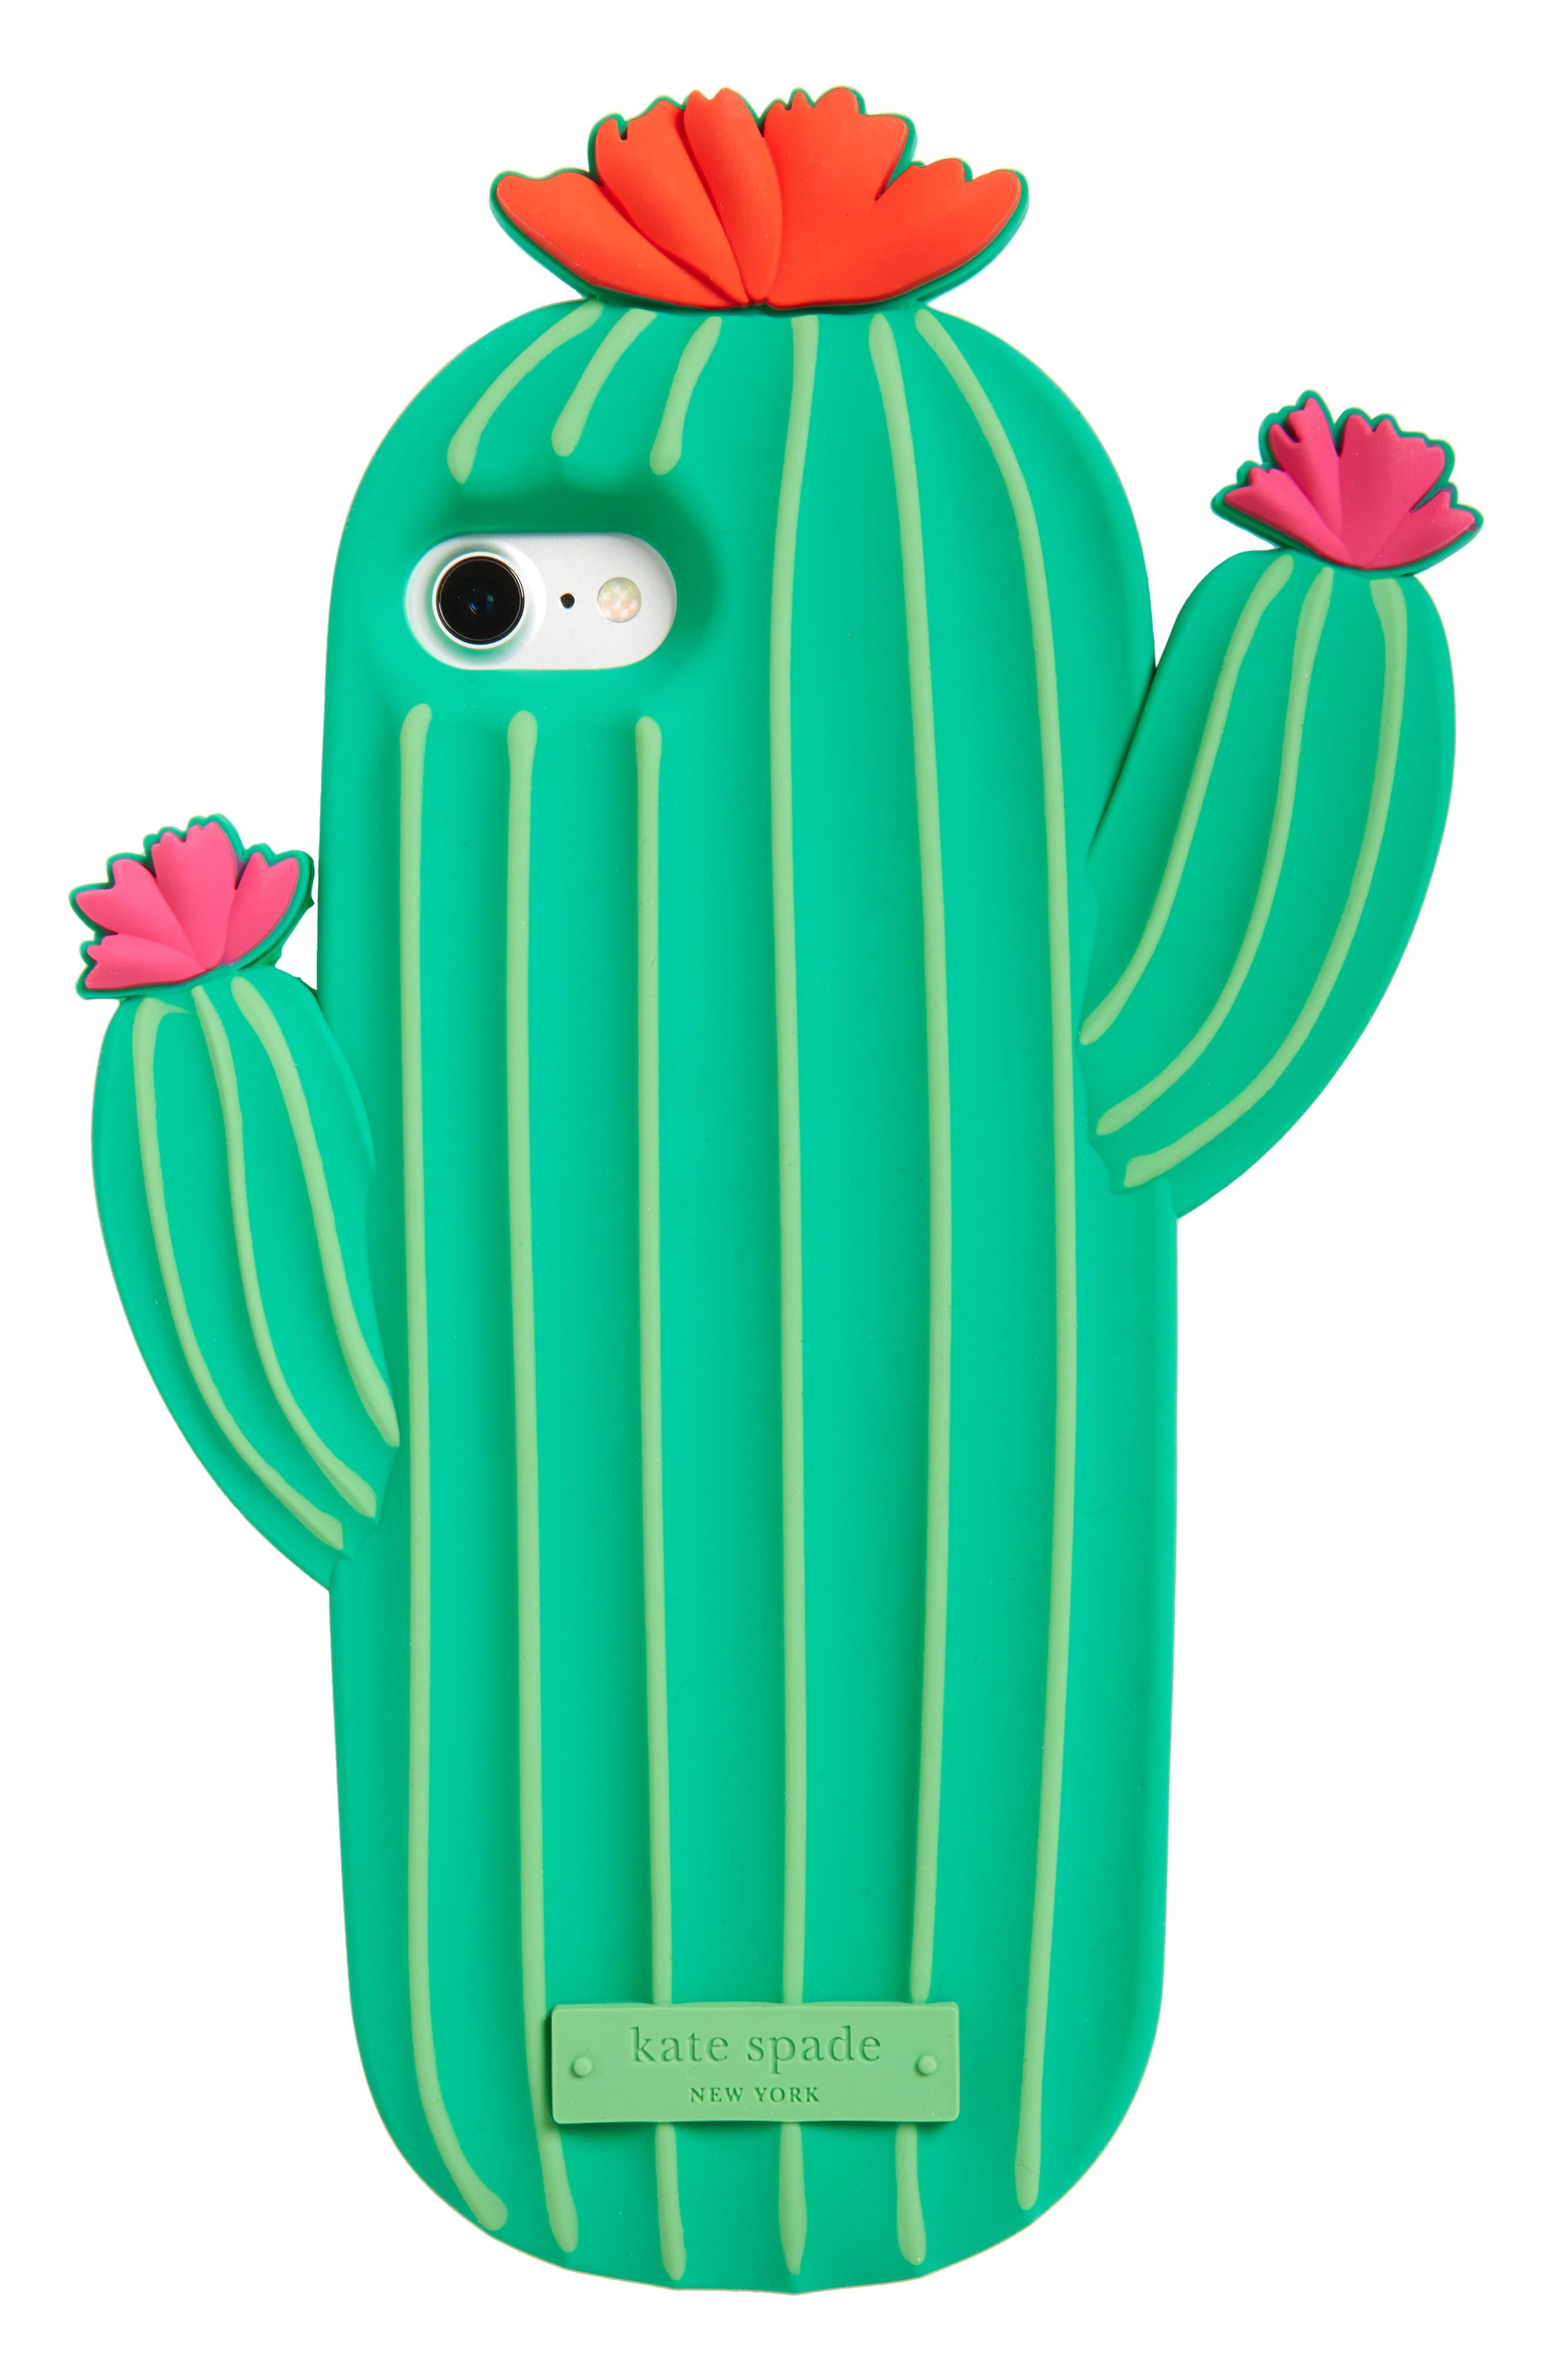 kate spade new york cactus iPhone 7/8 case